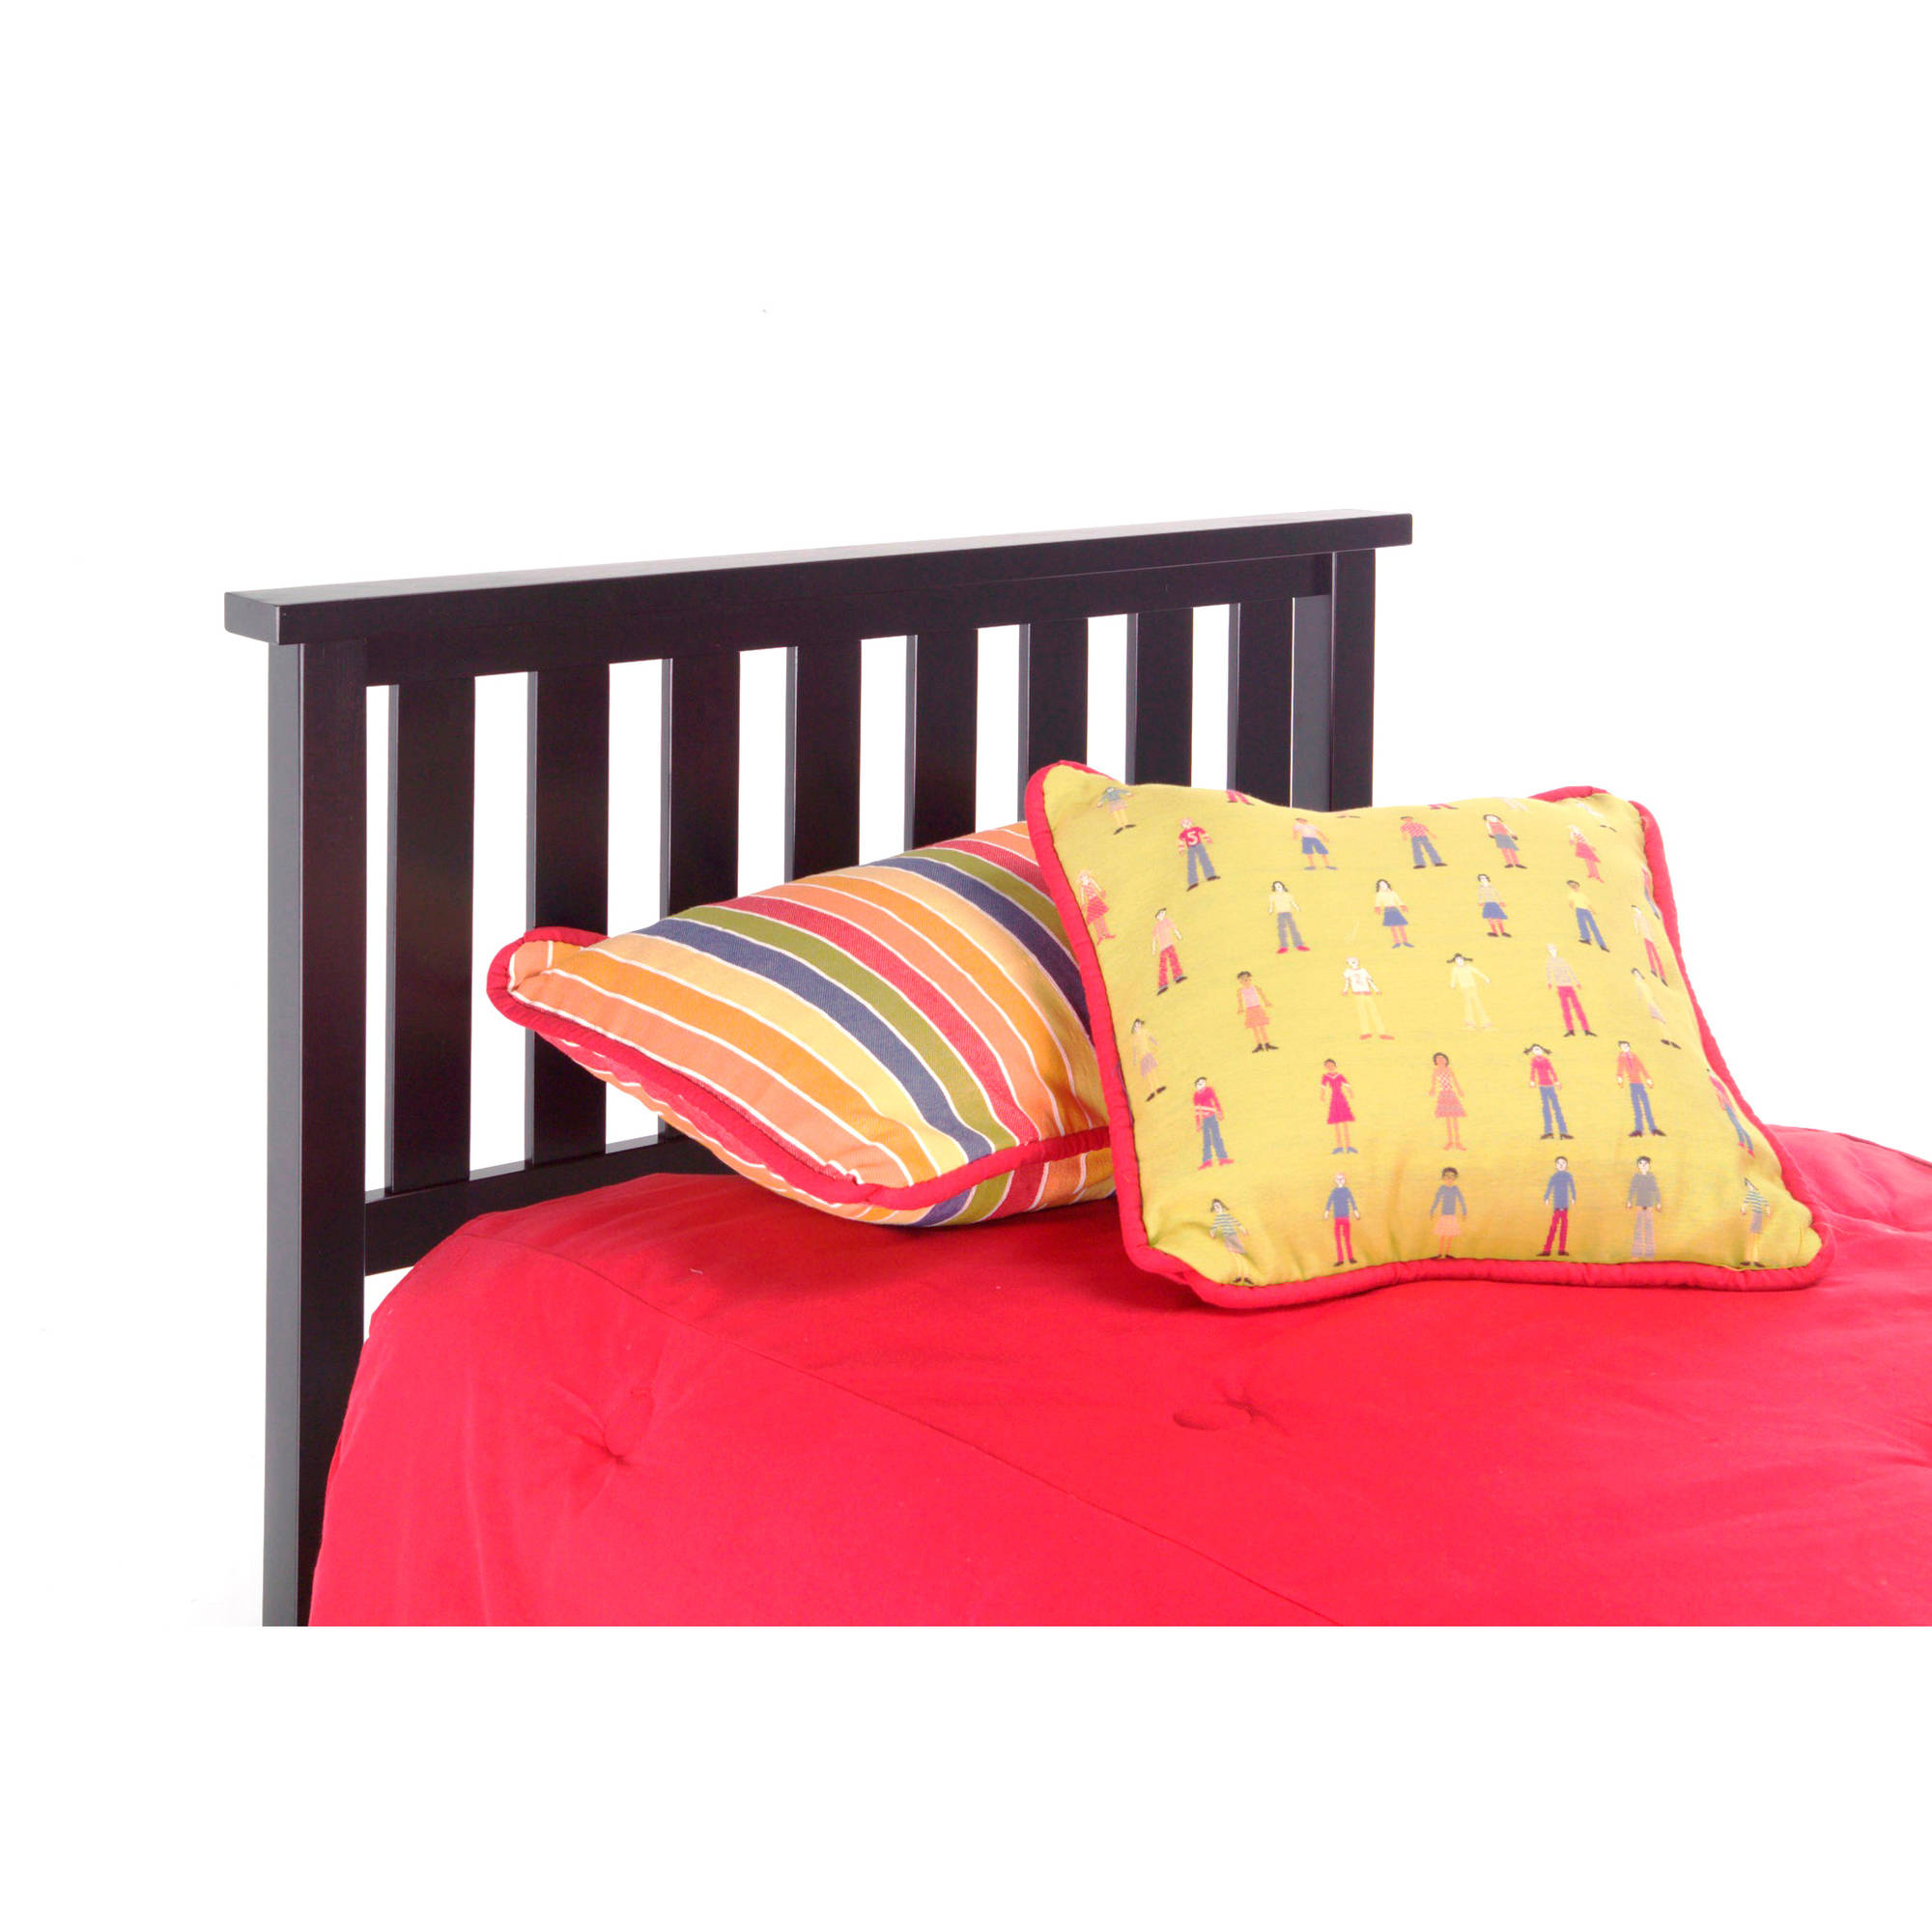 Fashion Bed Group by Leggett & Platt Belmont Headboard, Multiple Sizes & Colors